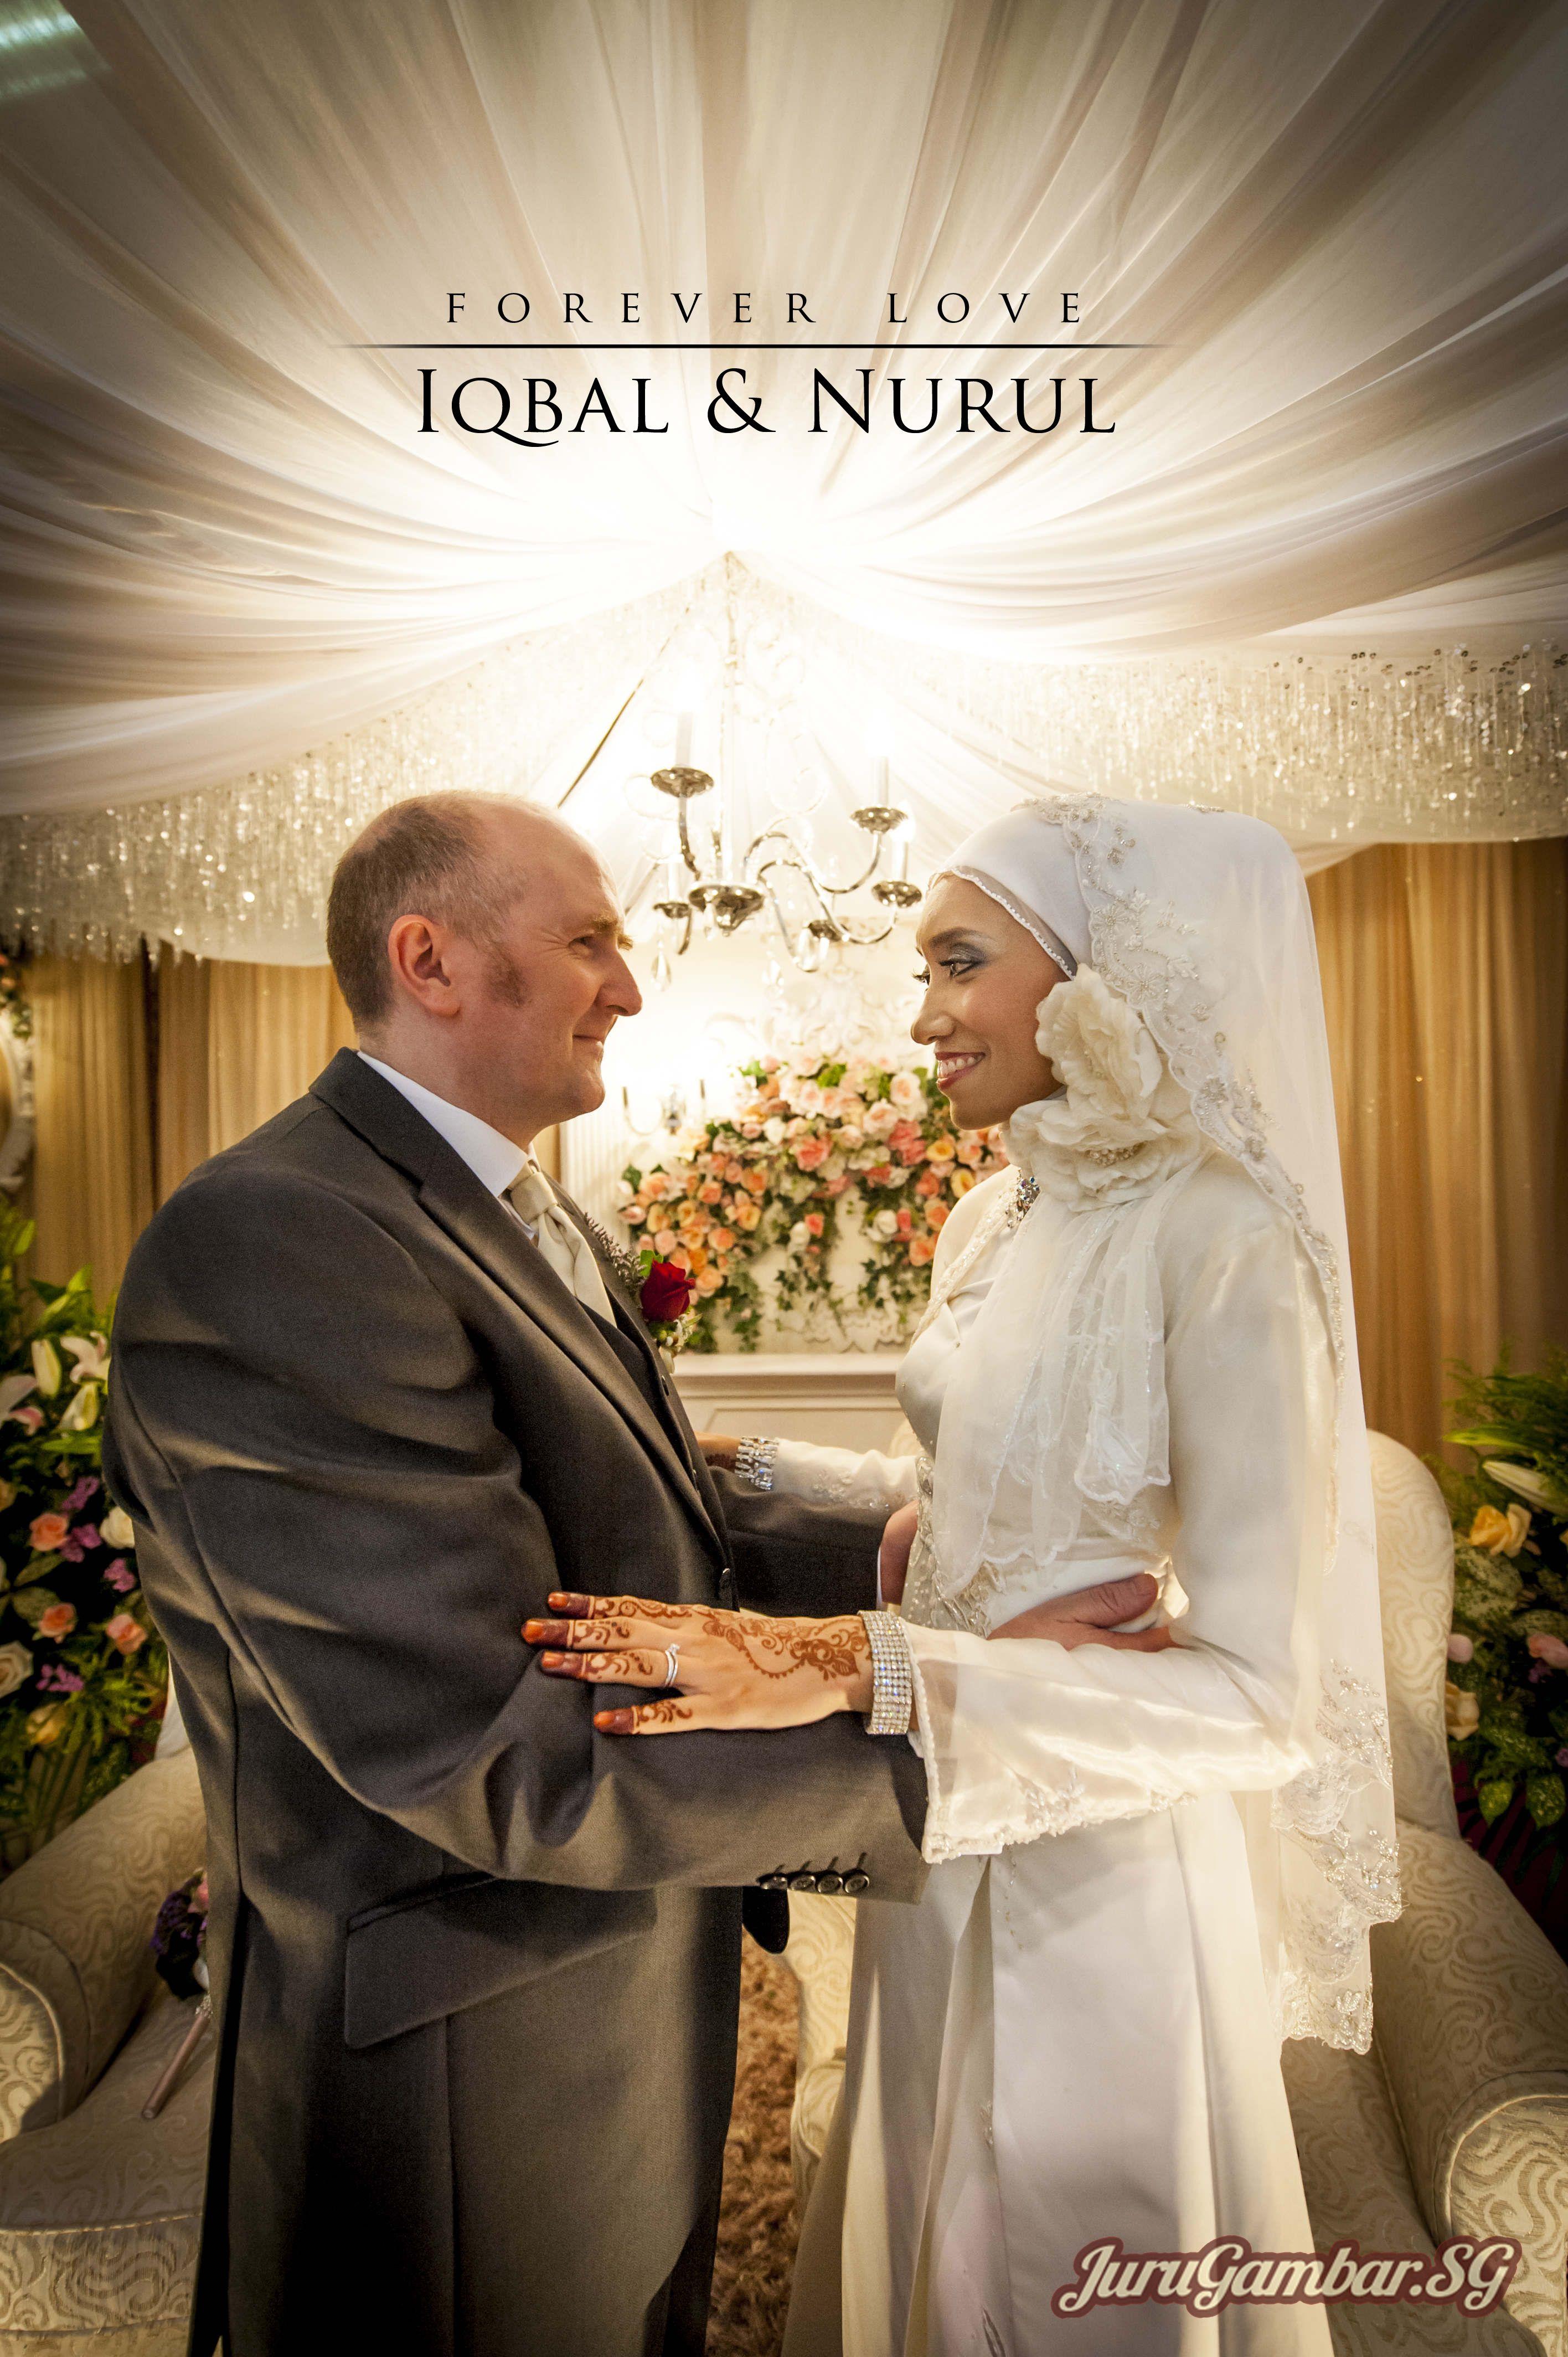 Malay Wedding Photography Singapore Malay Wedding Dress Wedding Photography Wedding Poses